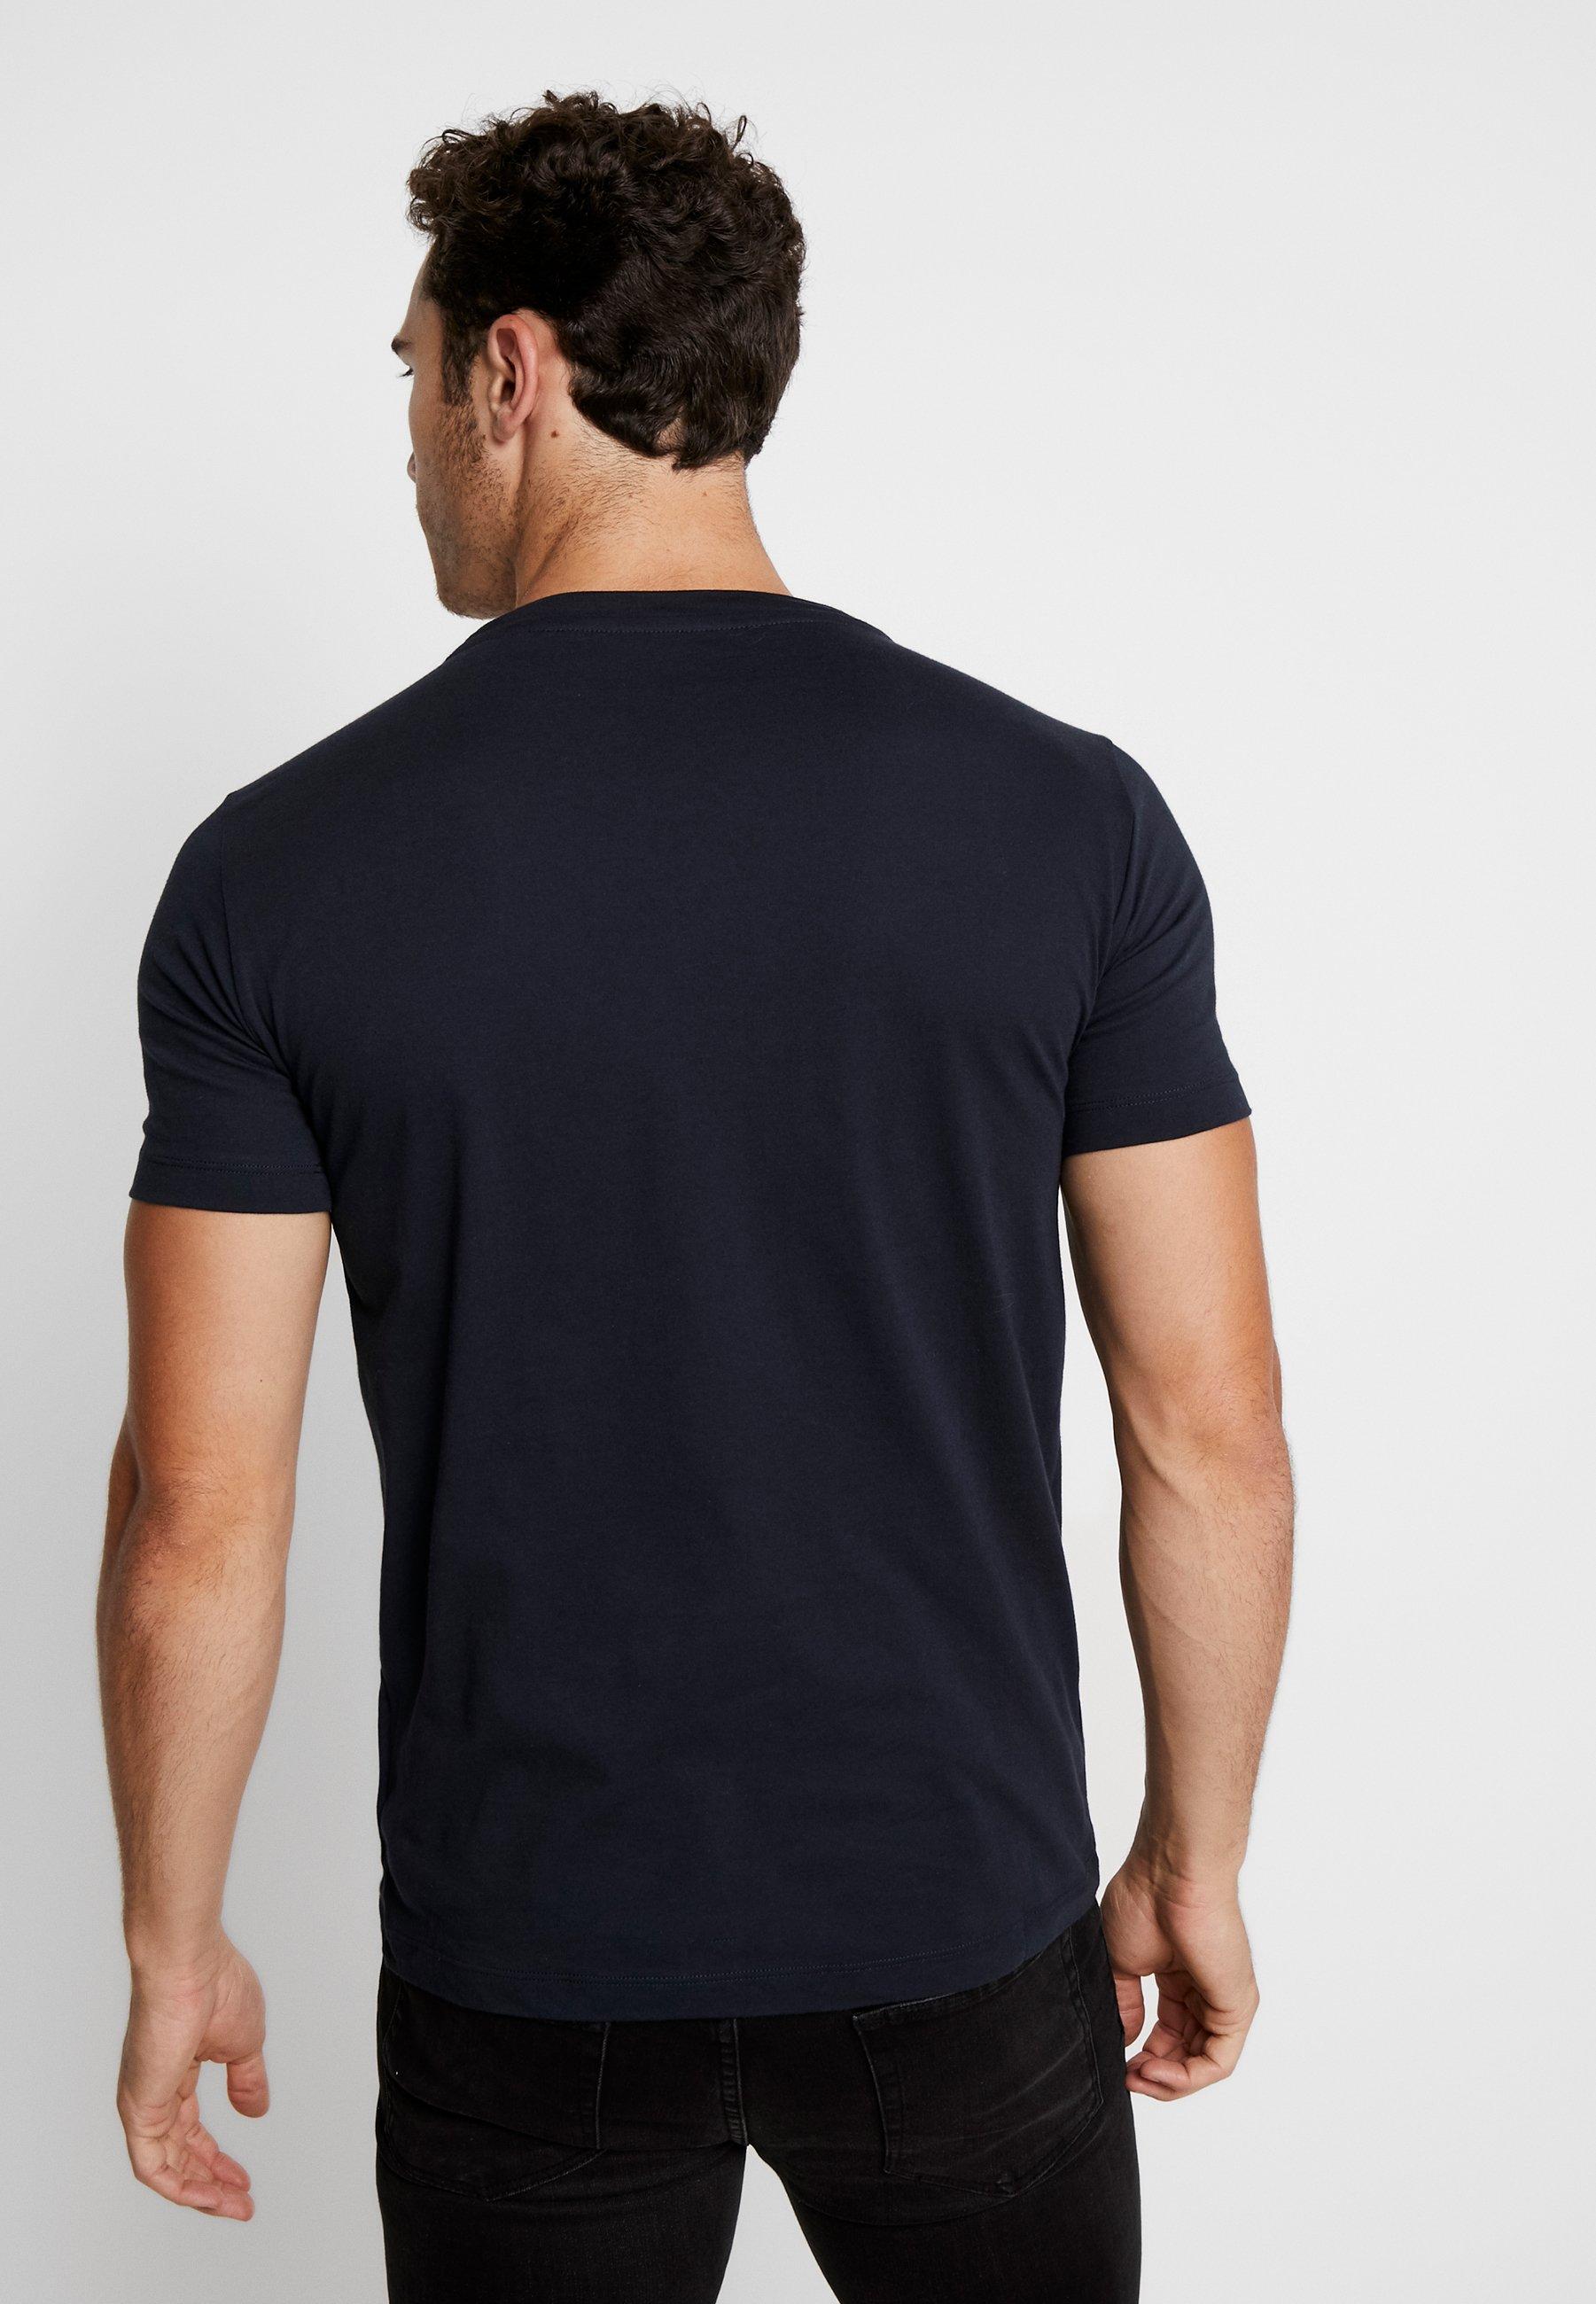 Replay Navy Basique PackT 2 shirt k8wPXn0O